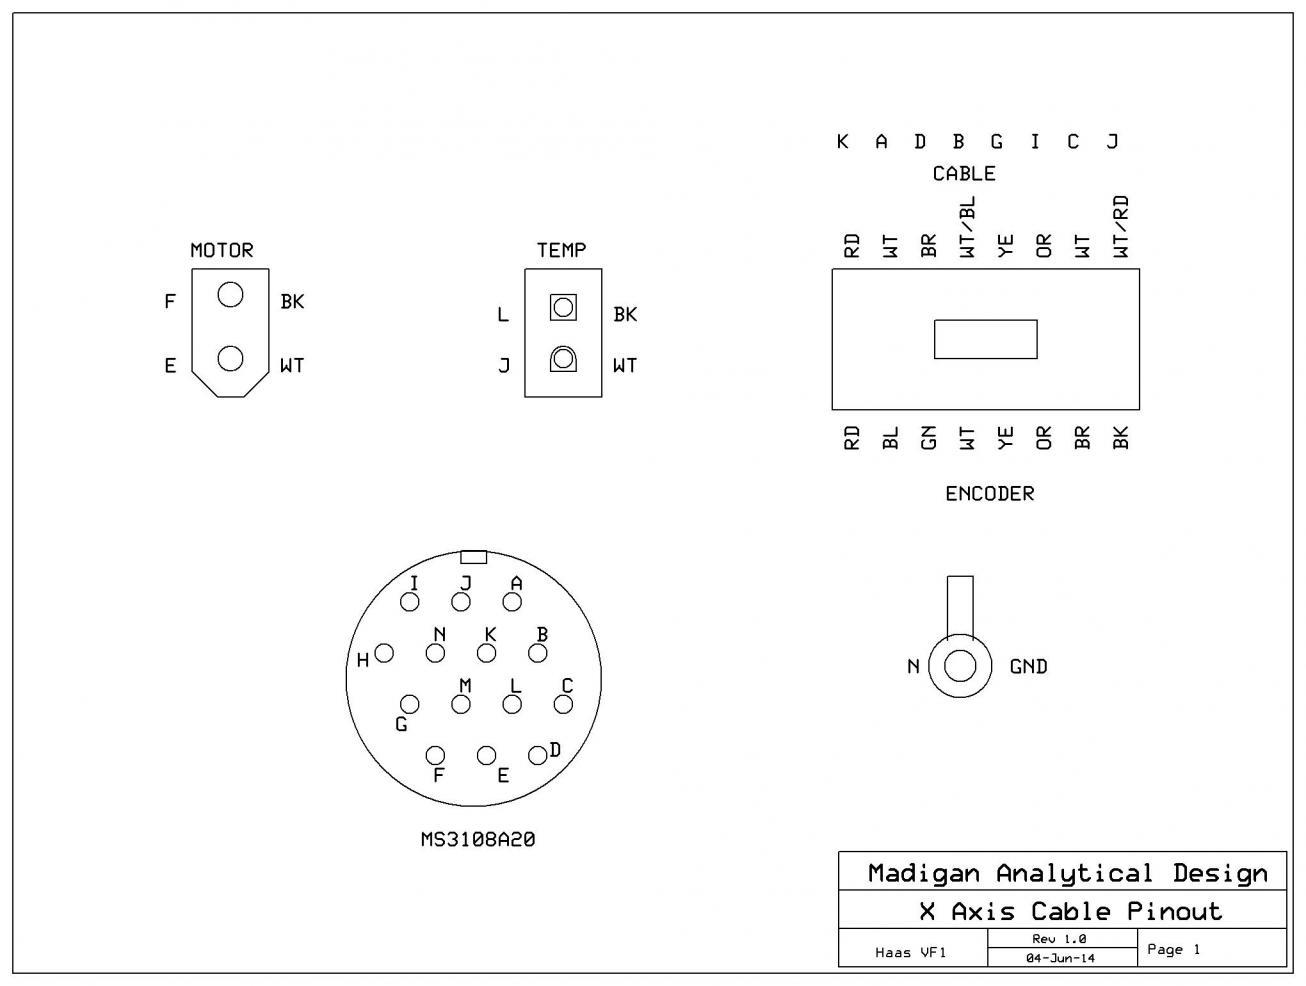 haas encoder wiring diagram wiring library. Black Bedroom Furniture Sets. Home Design Ideas